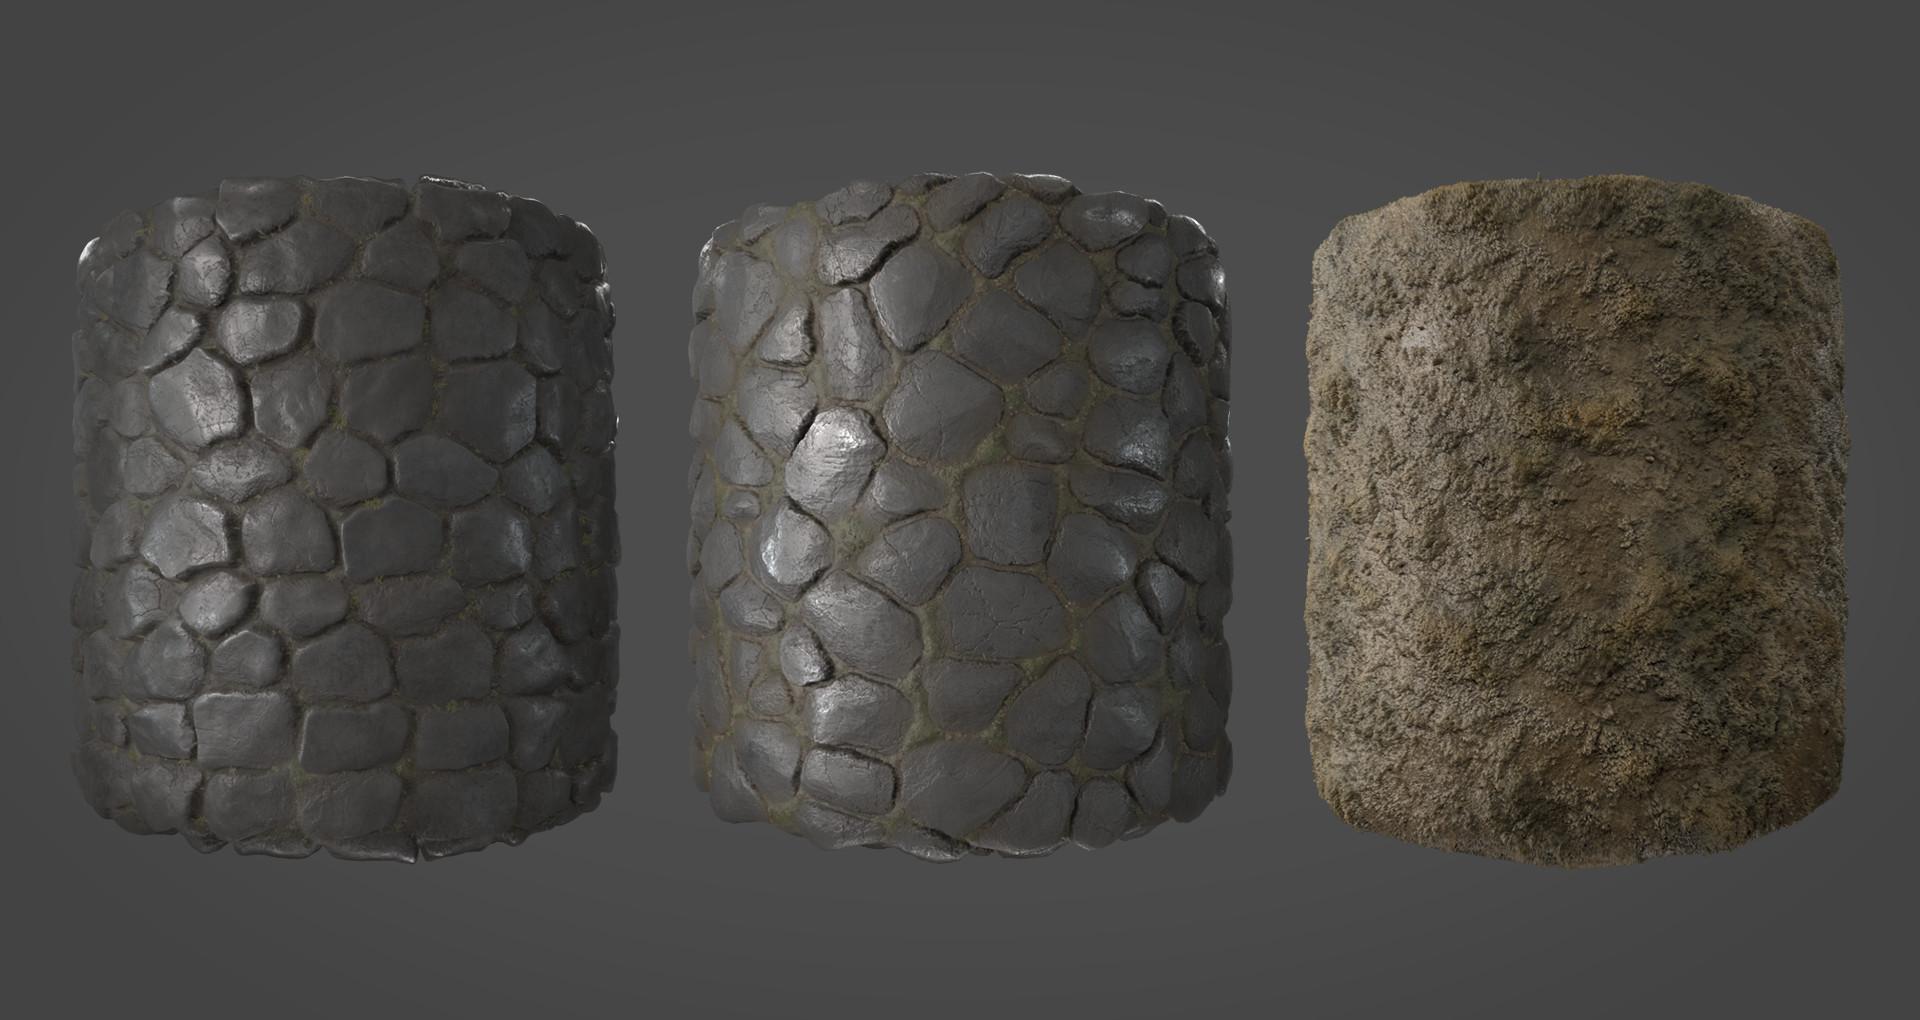 Alina godfrey materials